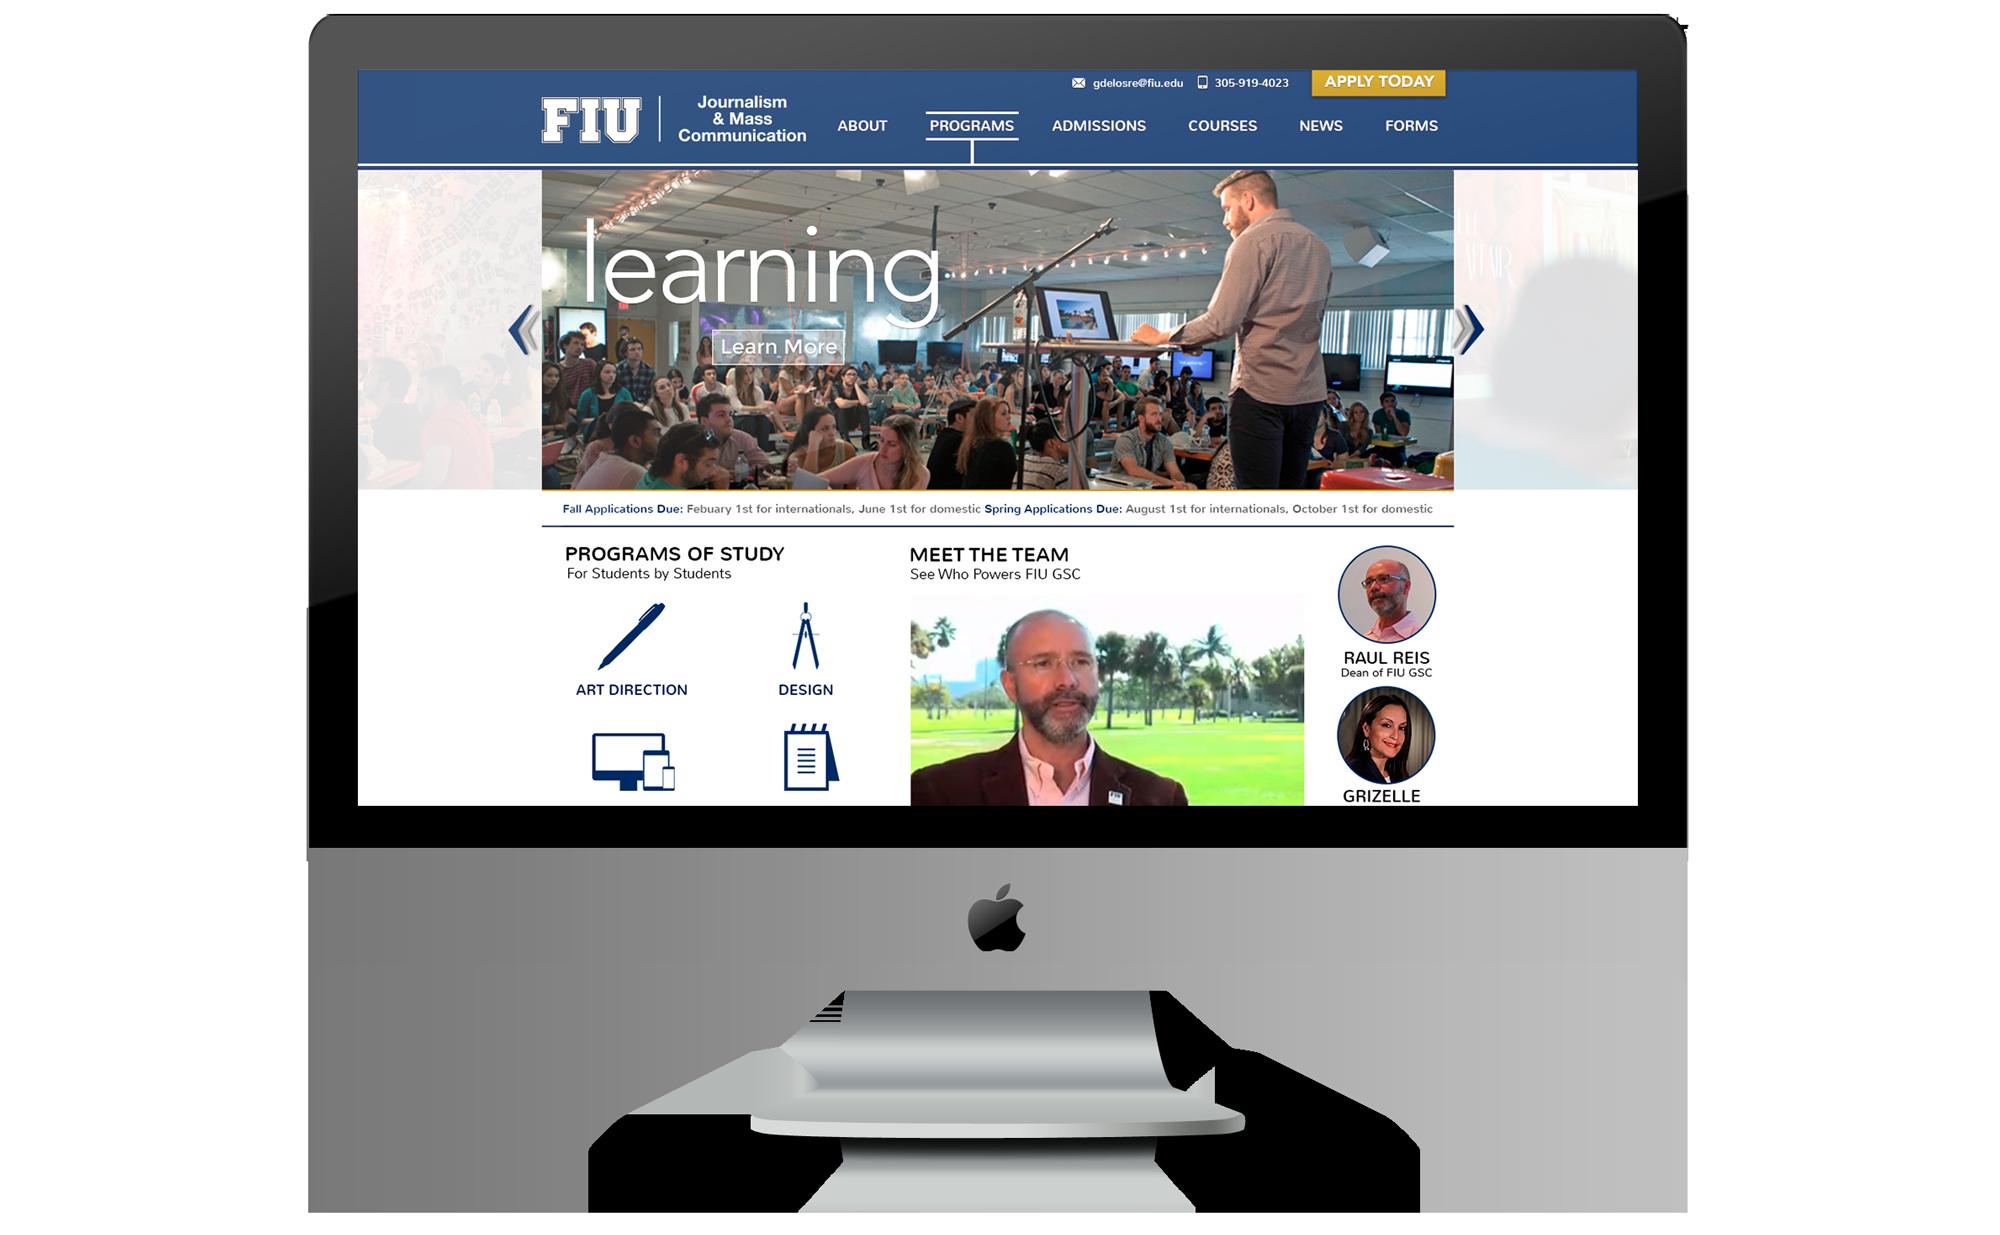 fiu-website-imac-mockup-DEFAULT-1.png